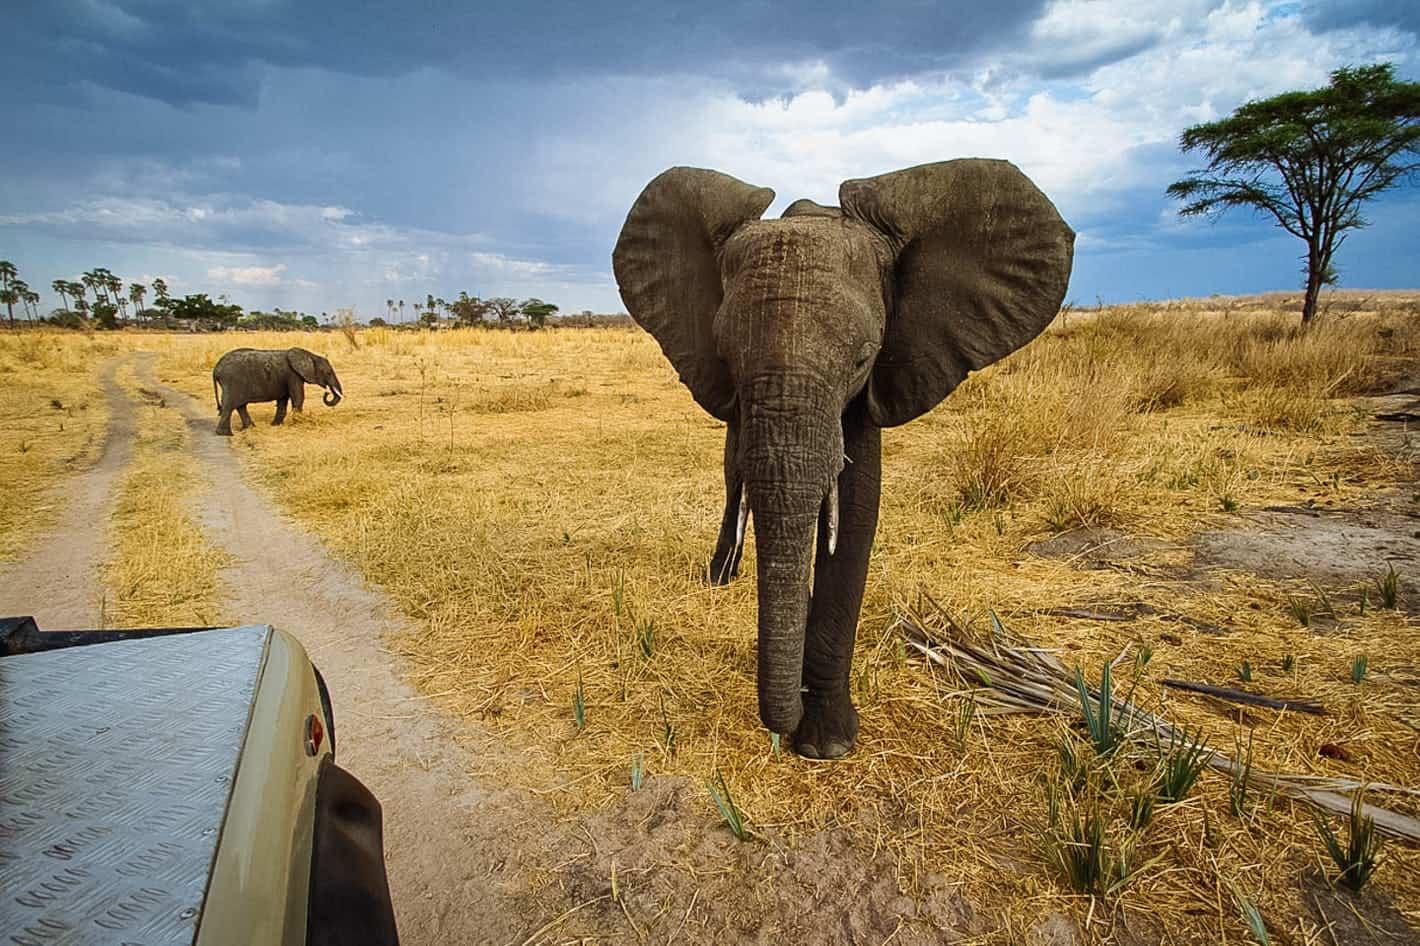 Tanzania Ruaha National Park Game Drive Wildlife Elephants Timbuktu Travel